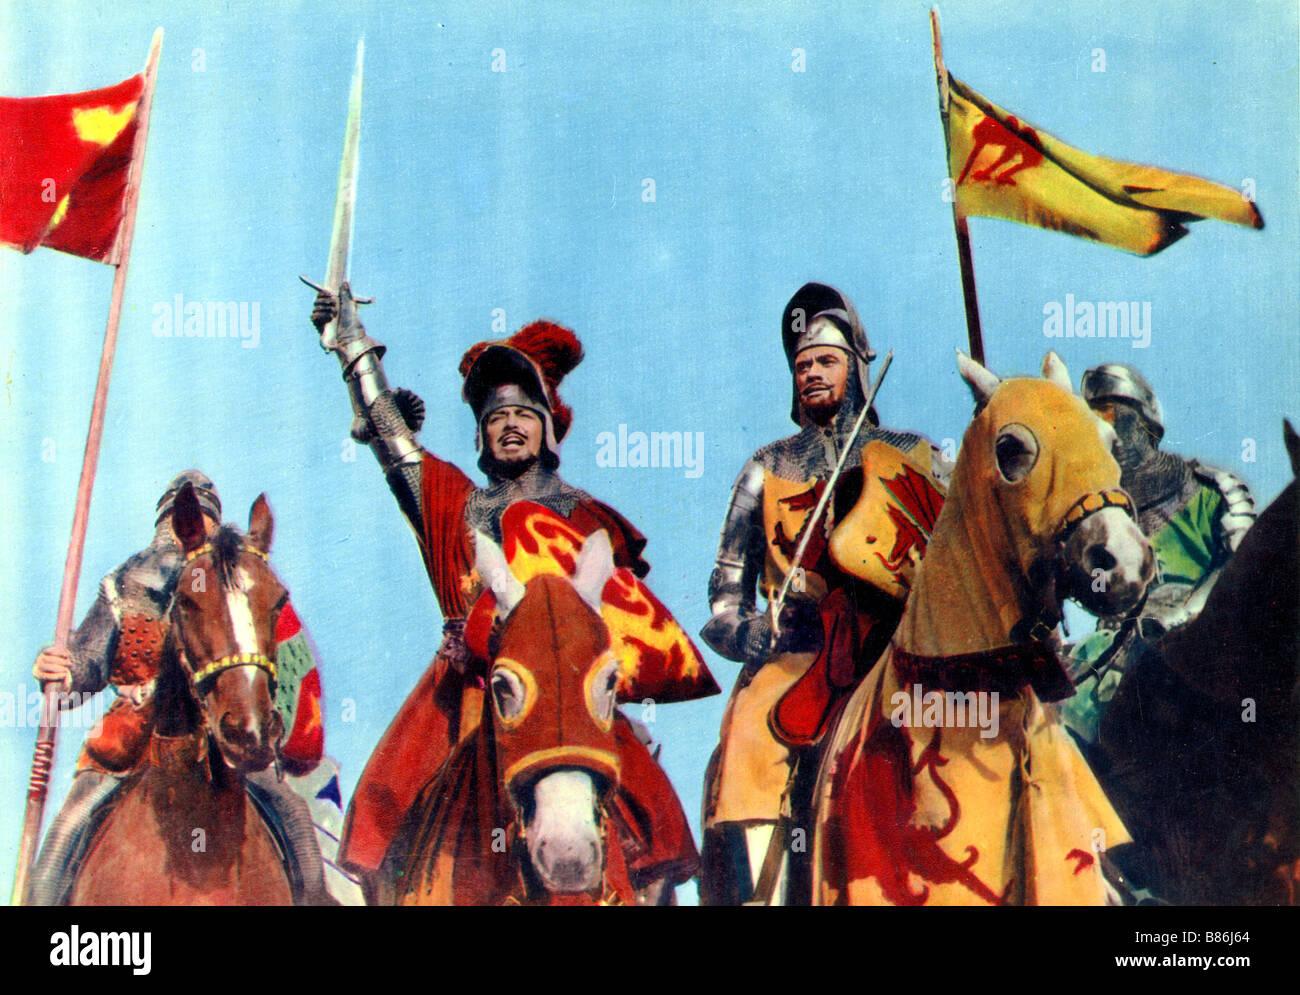 Lancelot and king arthur stock photos lancelot and king arthur knights of the round table year 1953 uk director richard thorpe robert taylor watchthetrailerfo